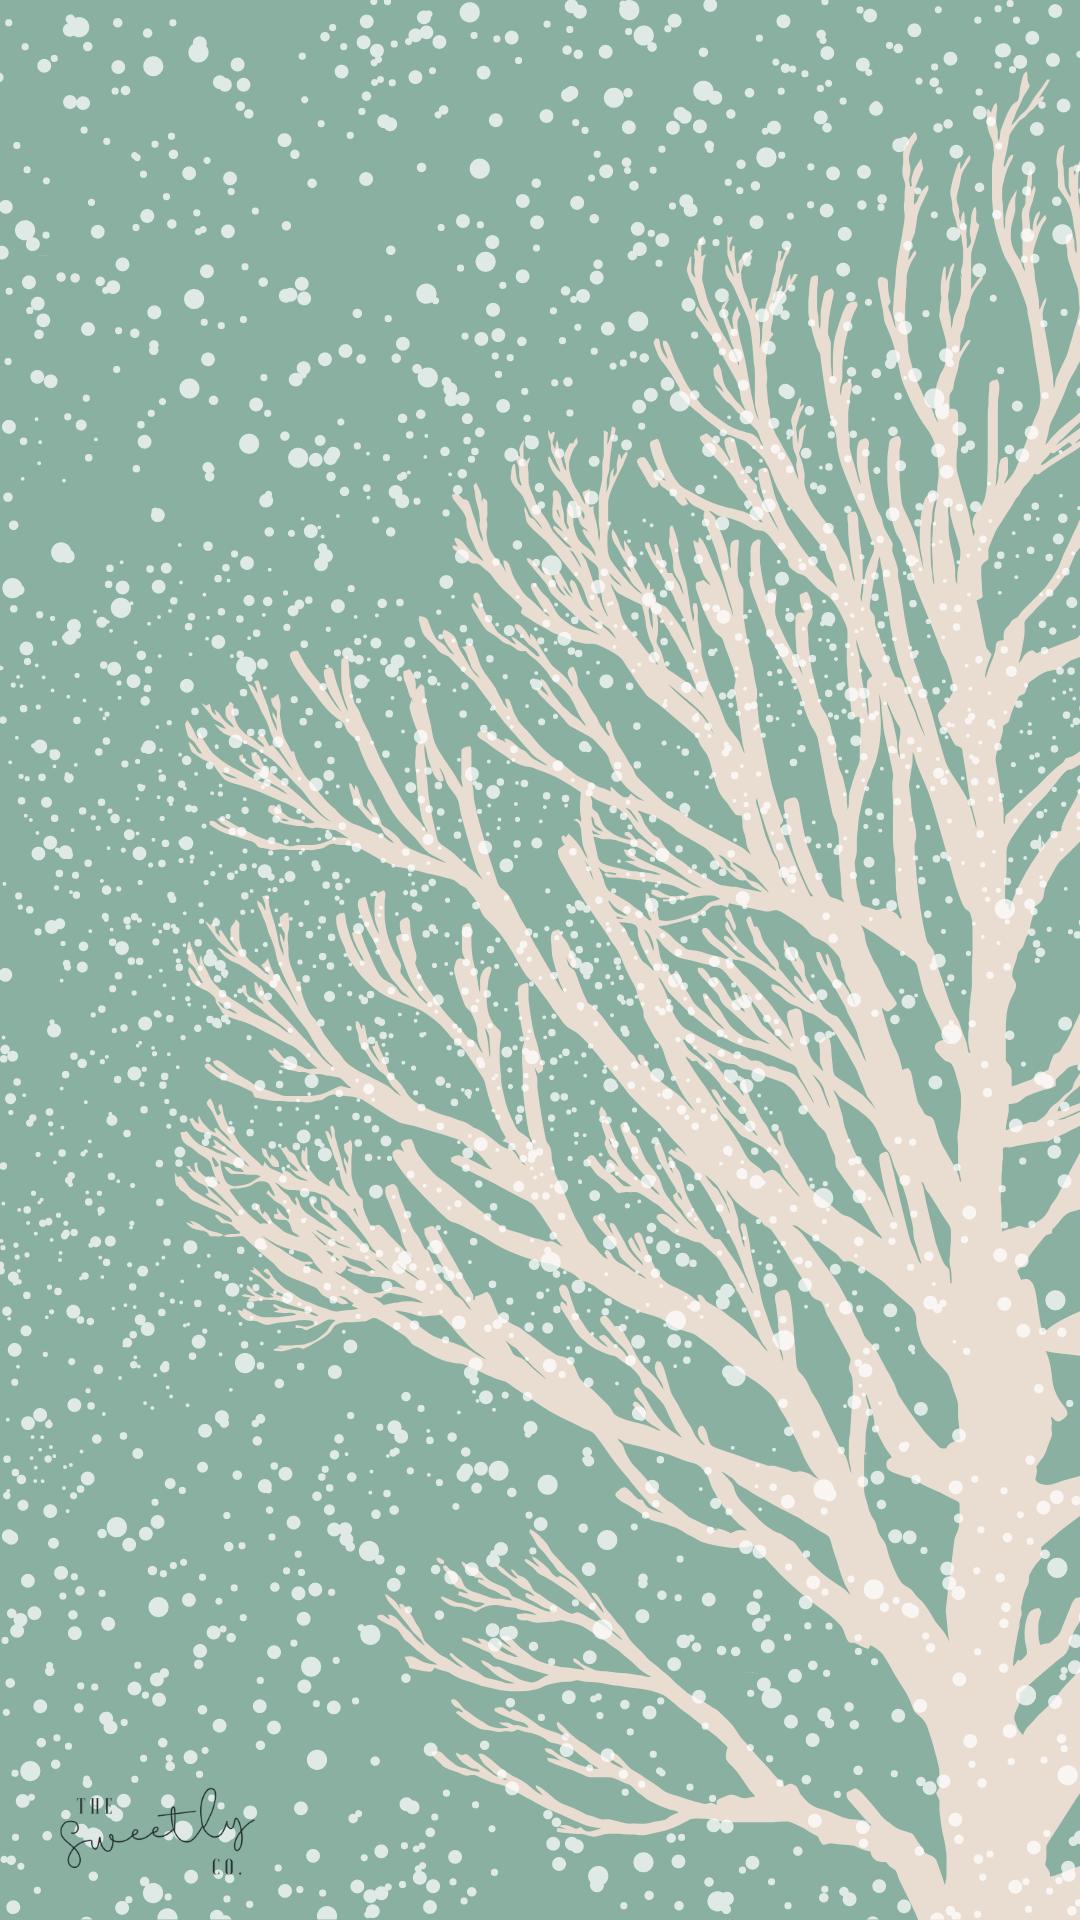 Snowy Winter Wallpaper Iphone Android Desktop Iphone Wallpaper Winter Winter Wallpaper Modern Desktop Wallpaper